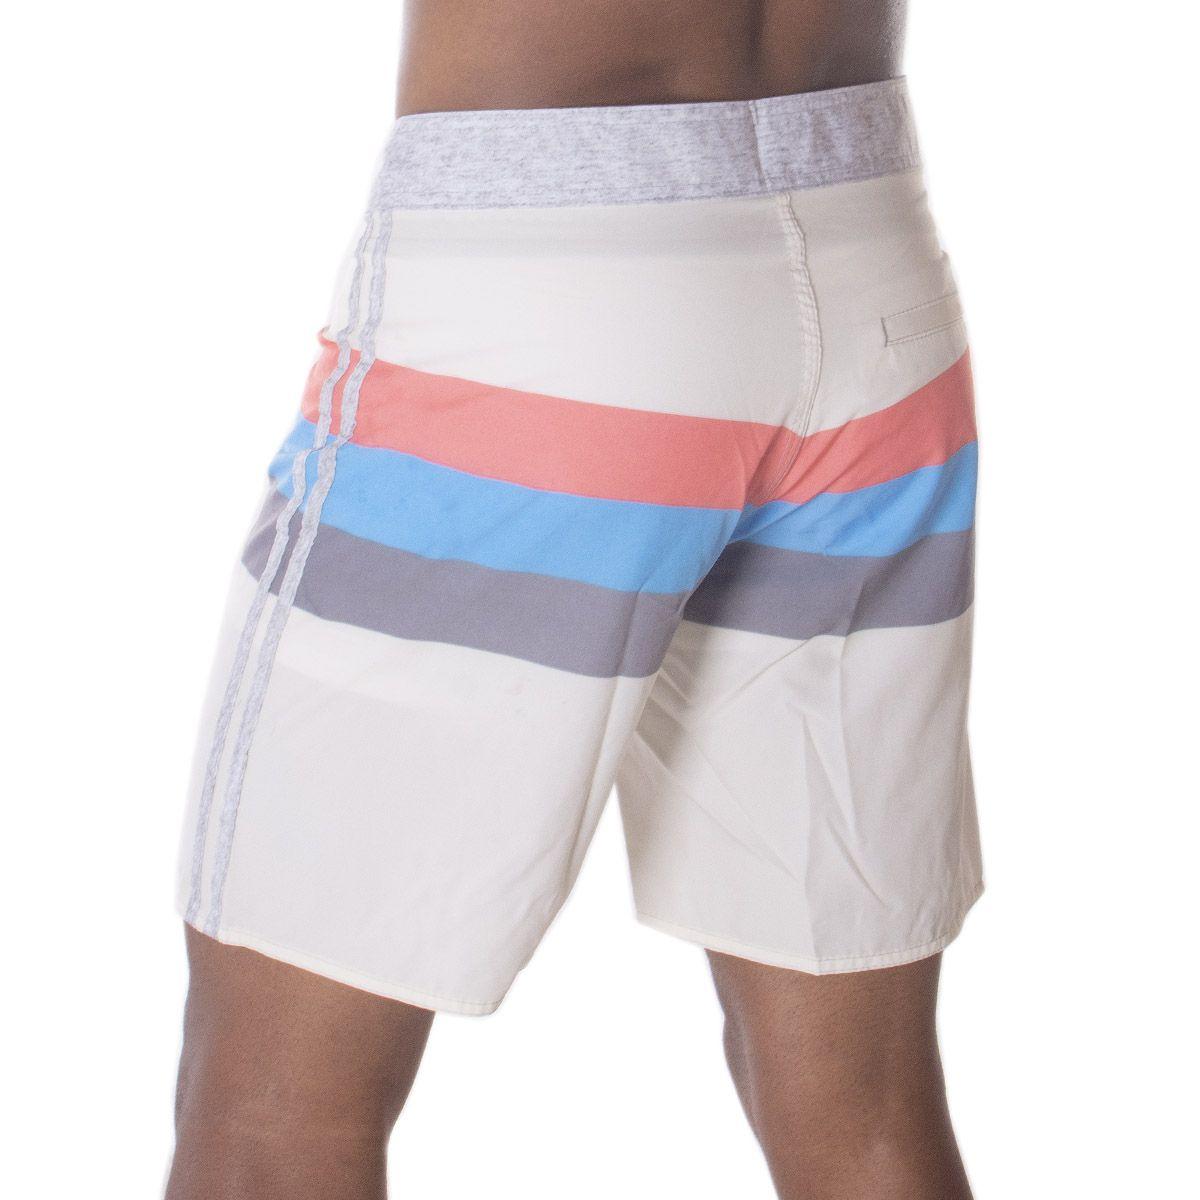 Short Masculino Lupo Beachwear .